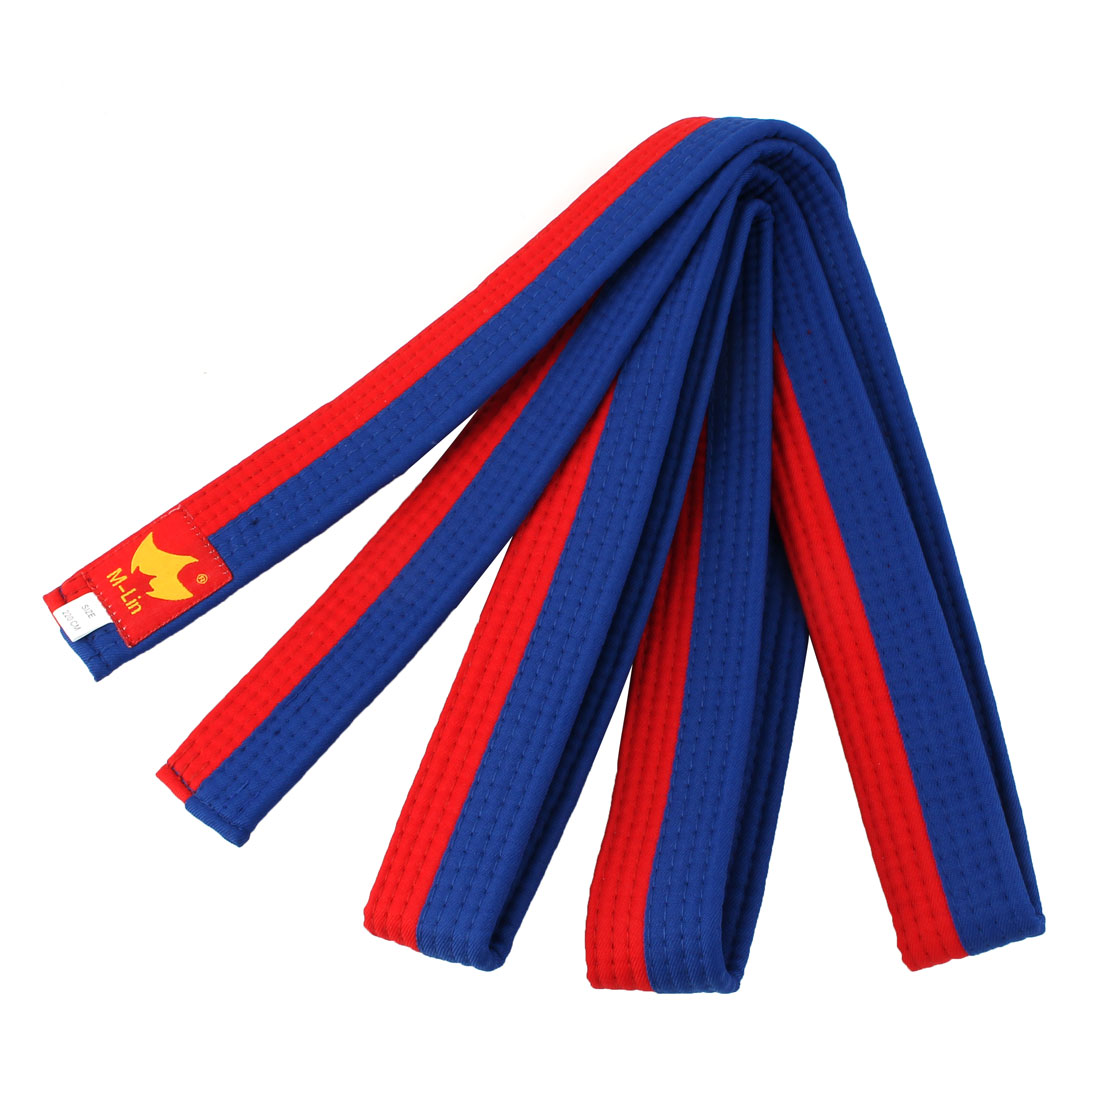 Taekwondo Cotton Blend Sporty Band Belt Blue Red 220cm Length